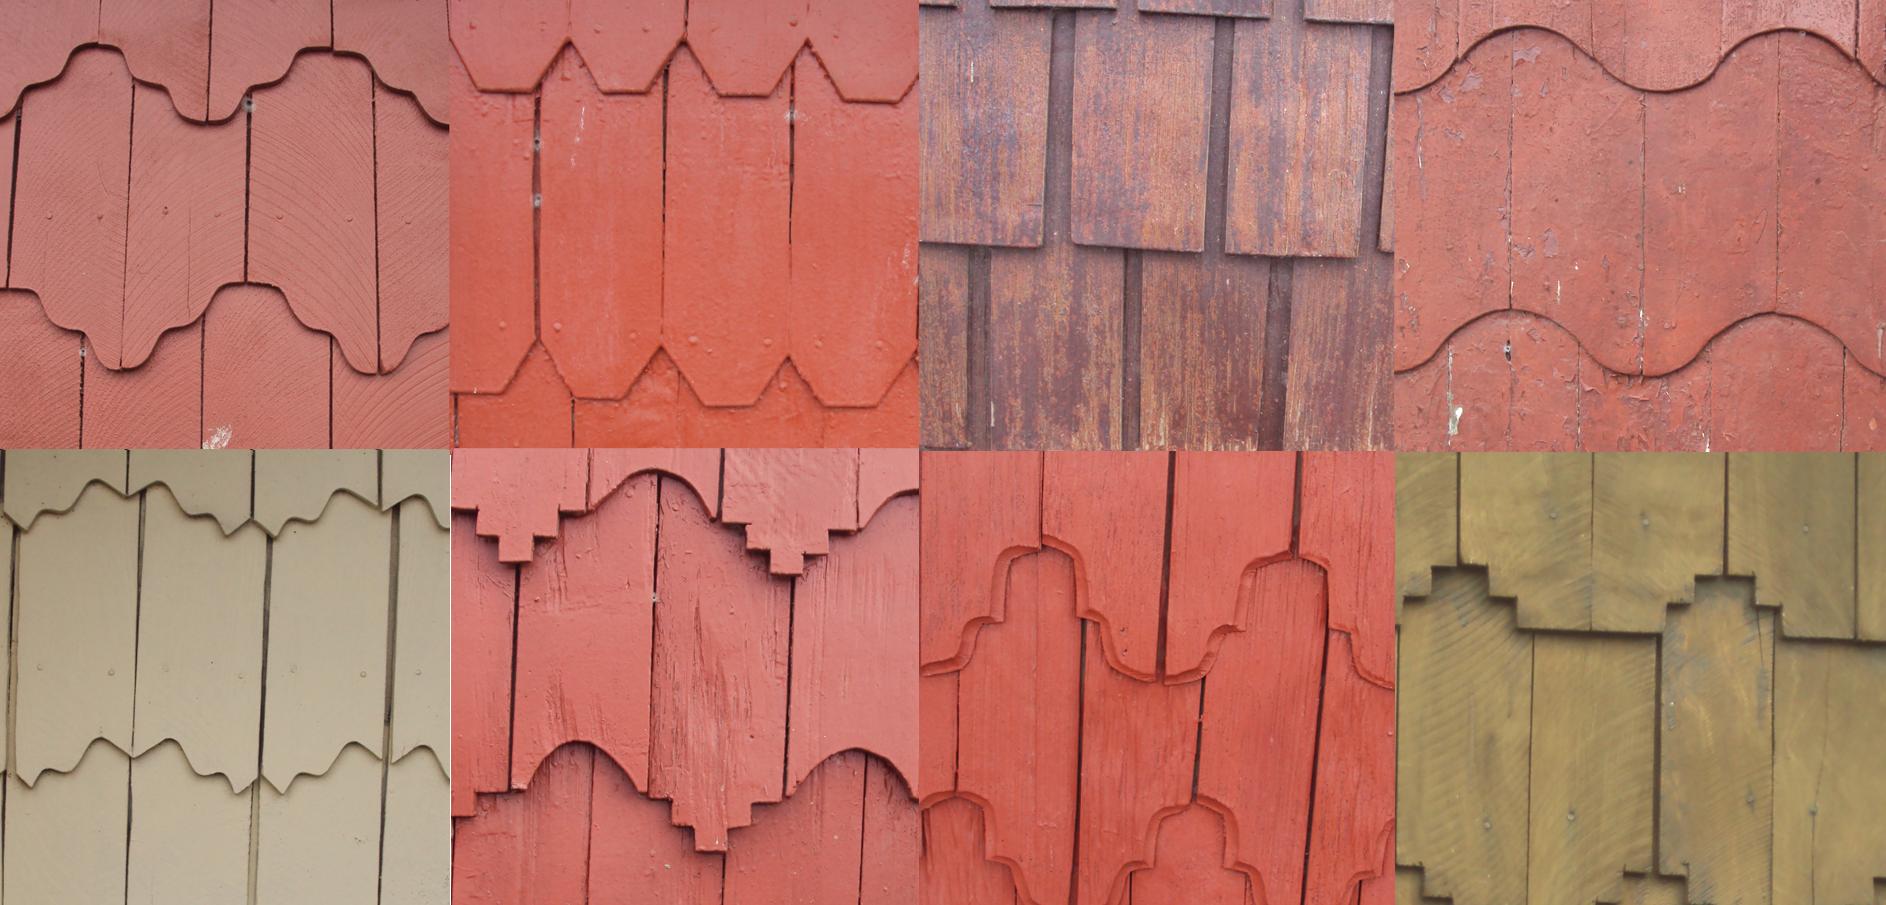 photo of wood shingles